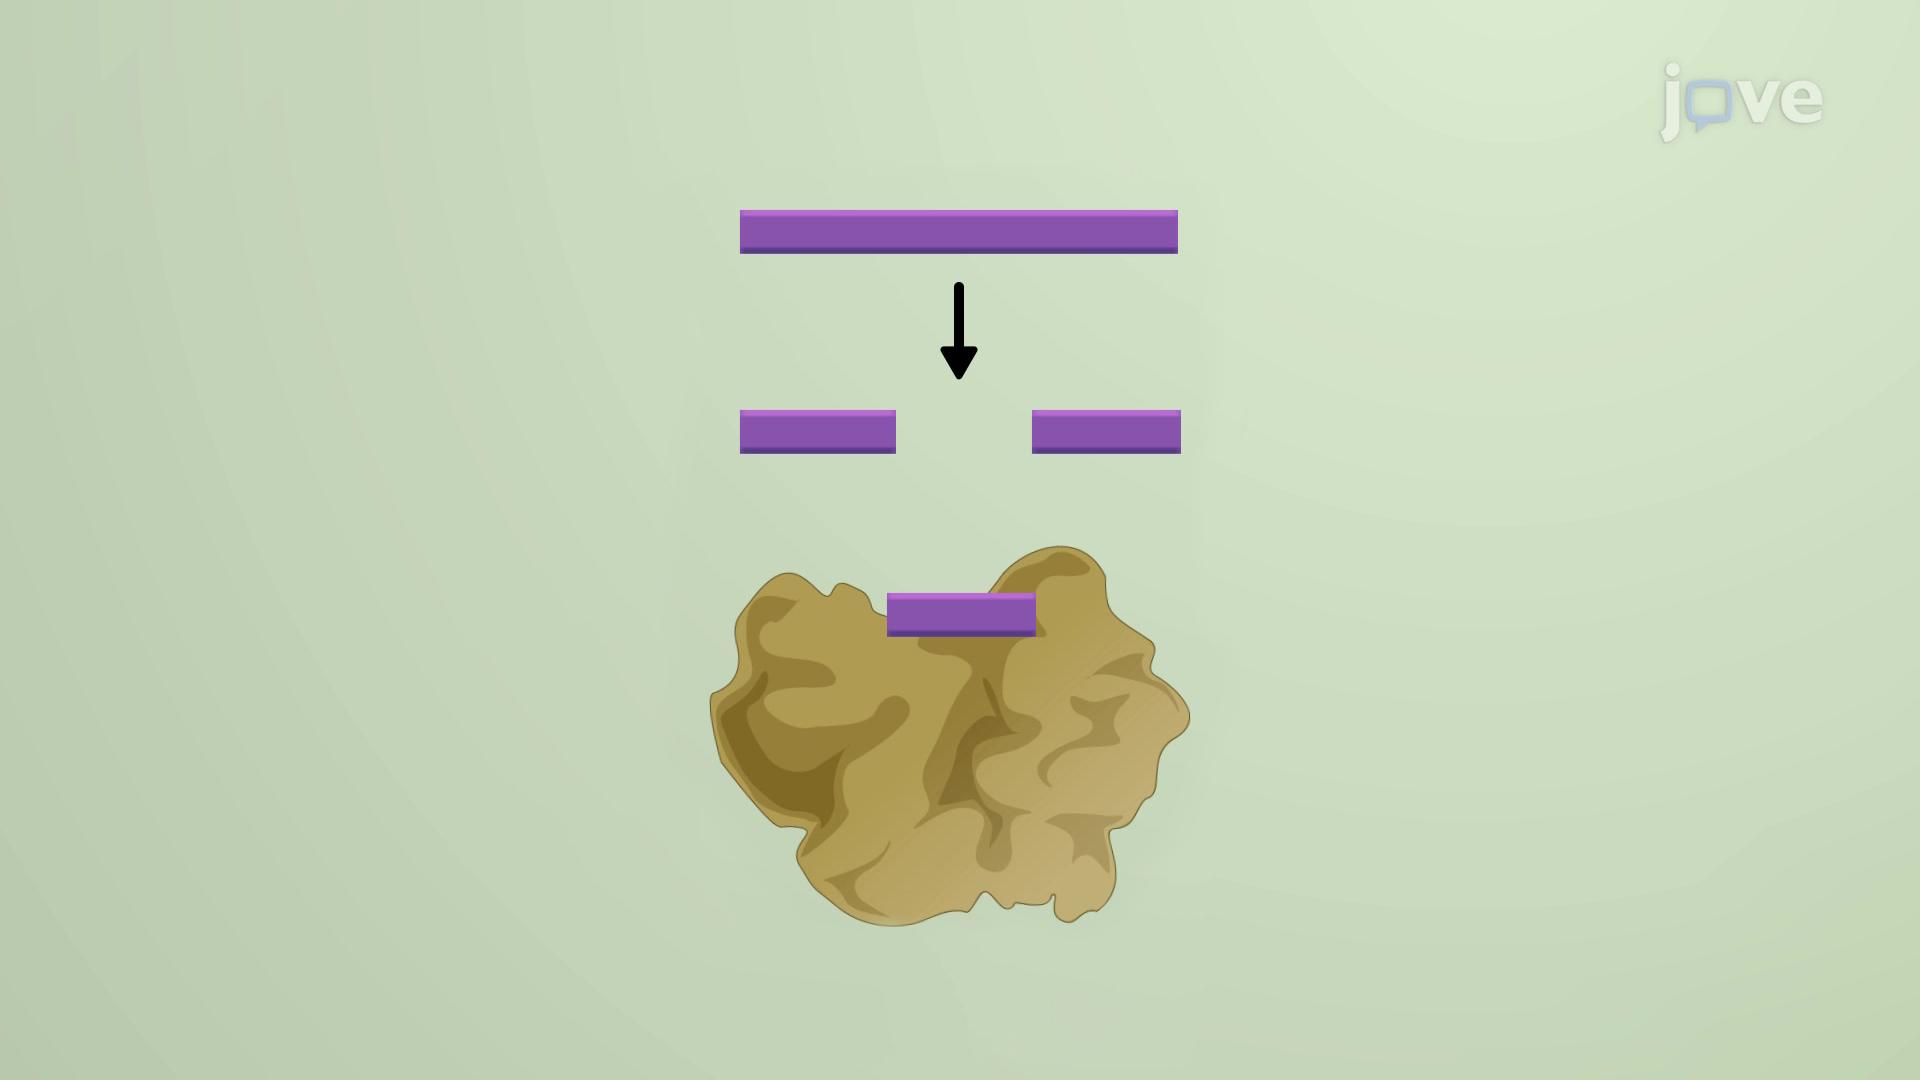 piRNA - Piwi-interacting RNAs